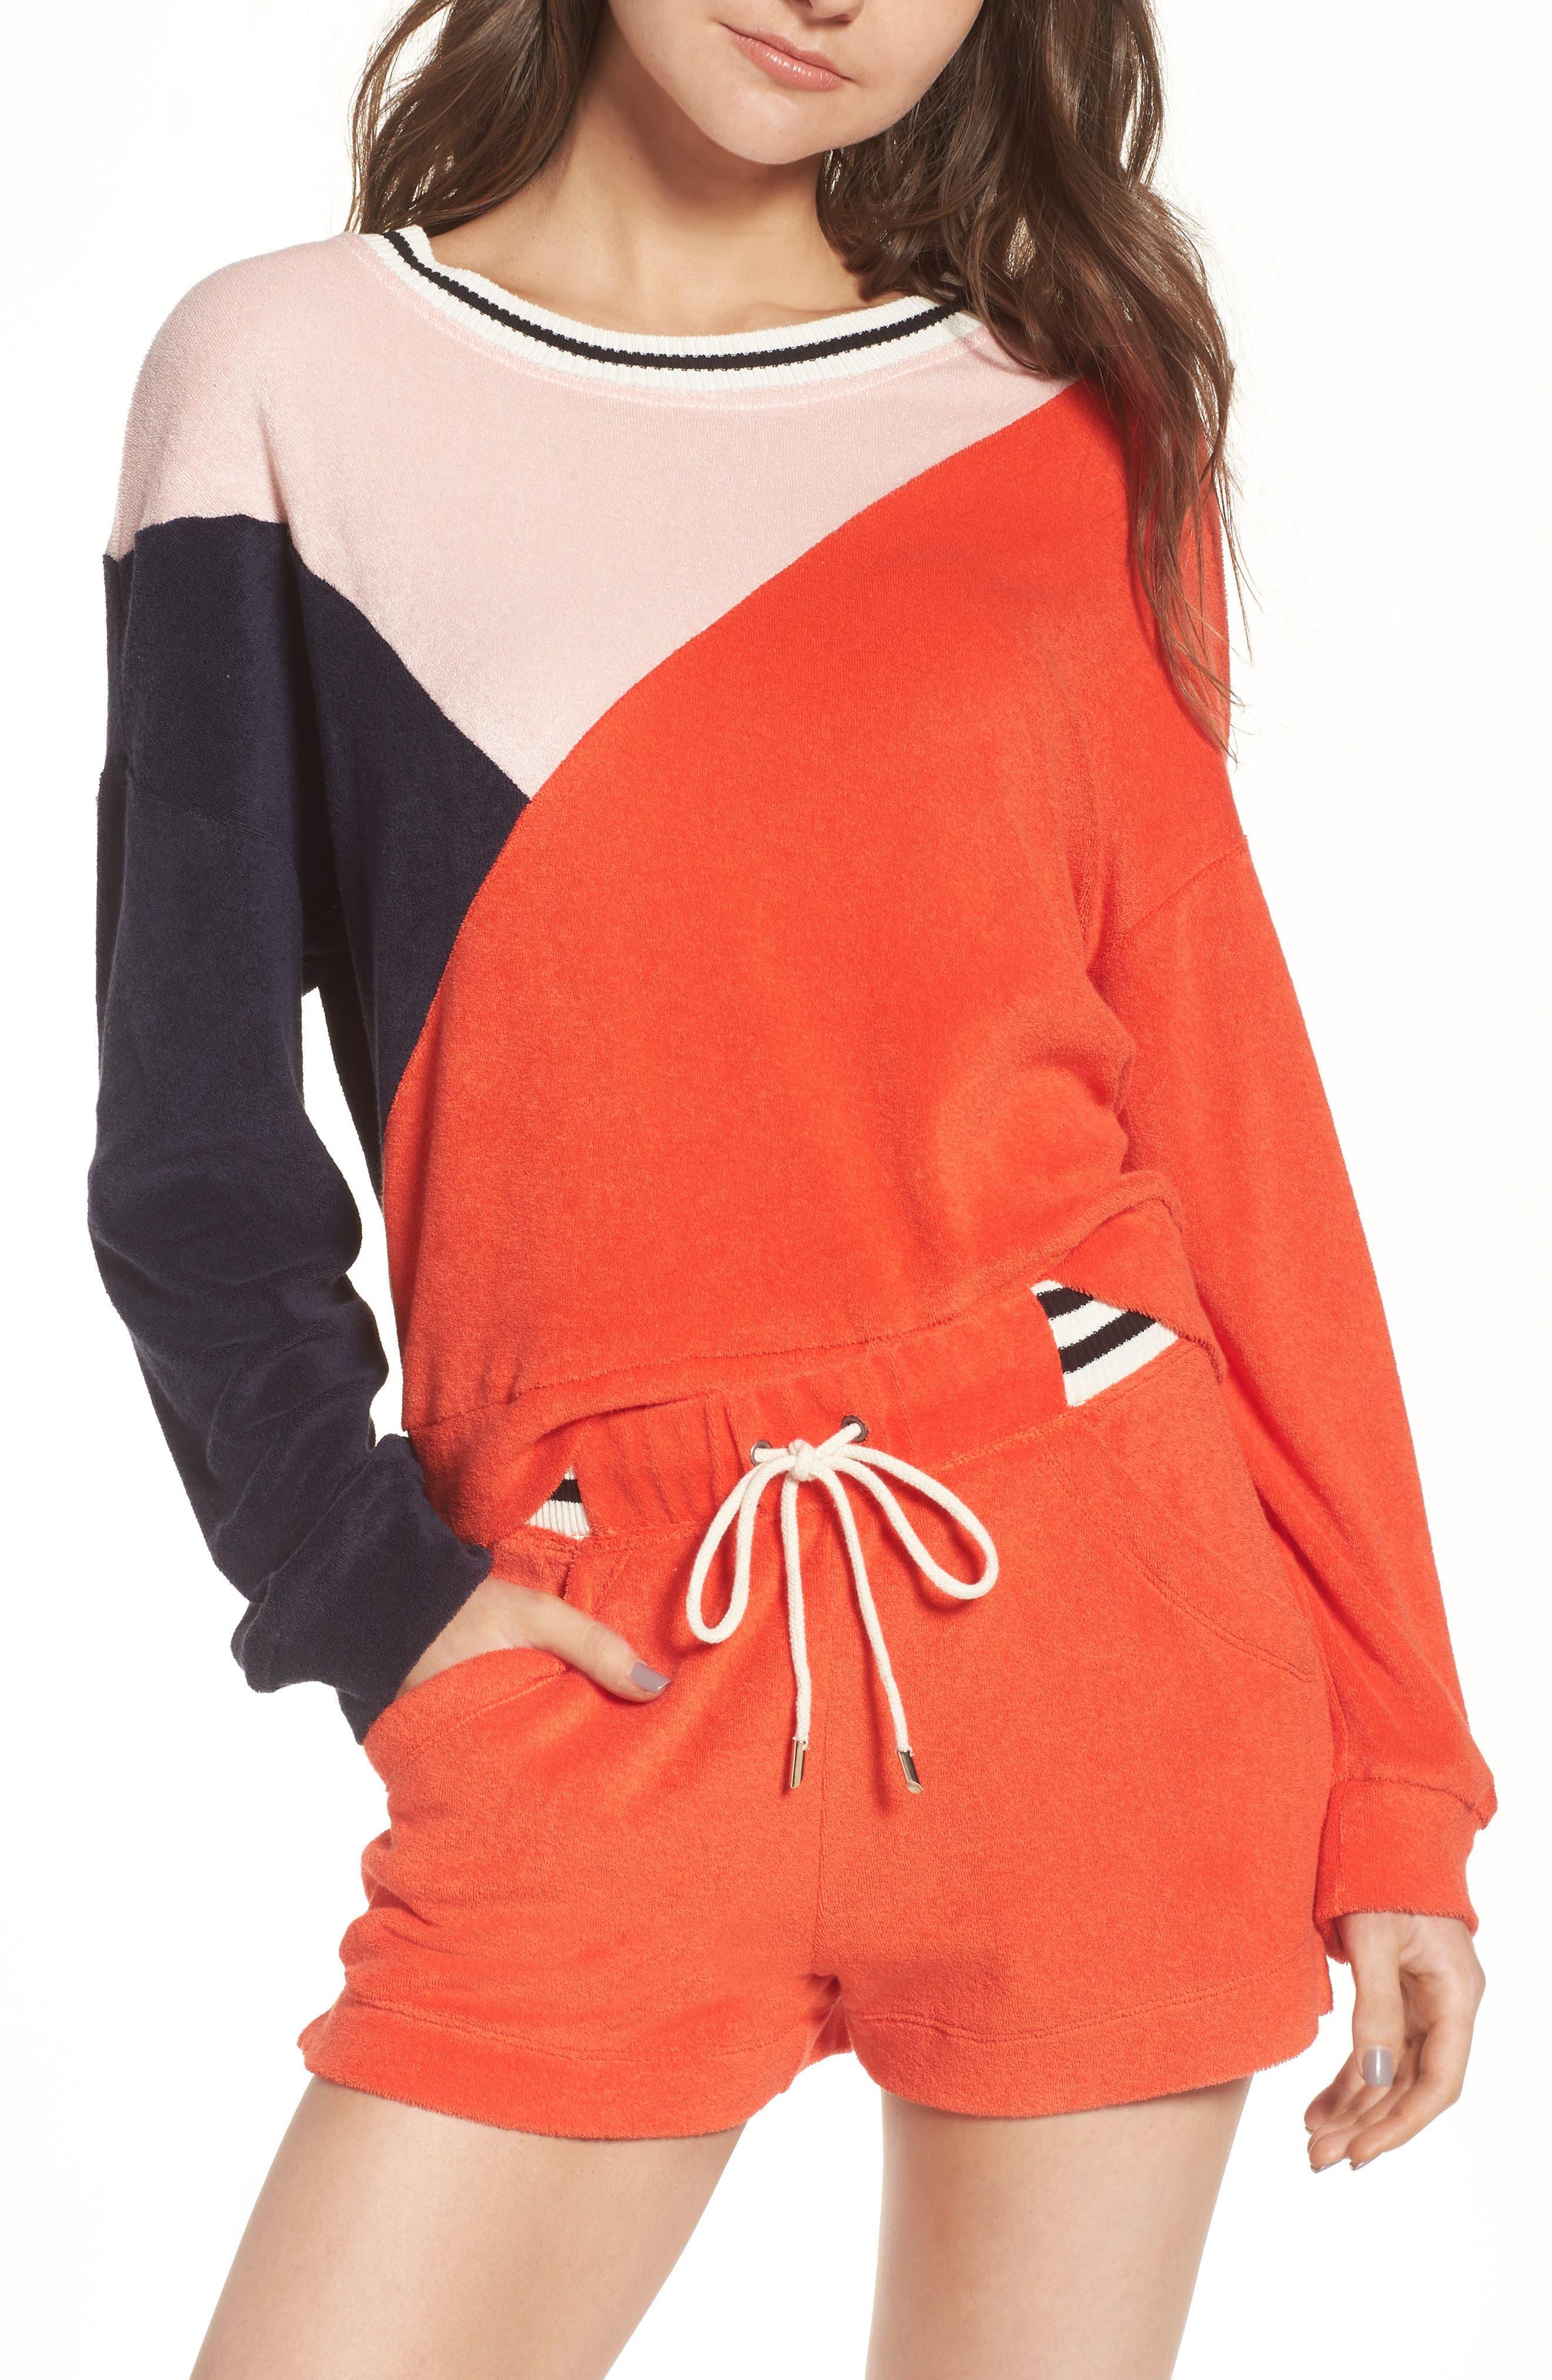 x Margherita Sportivo French Terry Sweatshirt,                             Main thumbnail 1, color,                             602